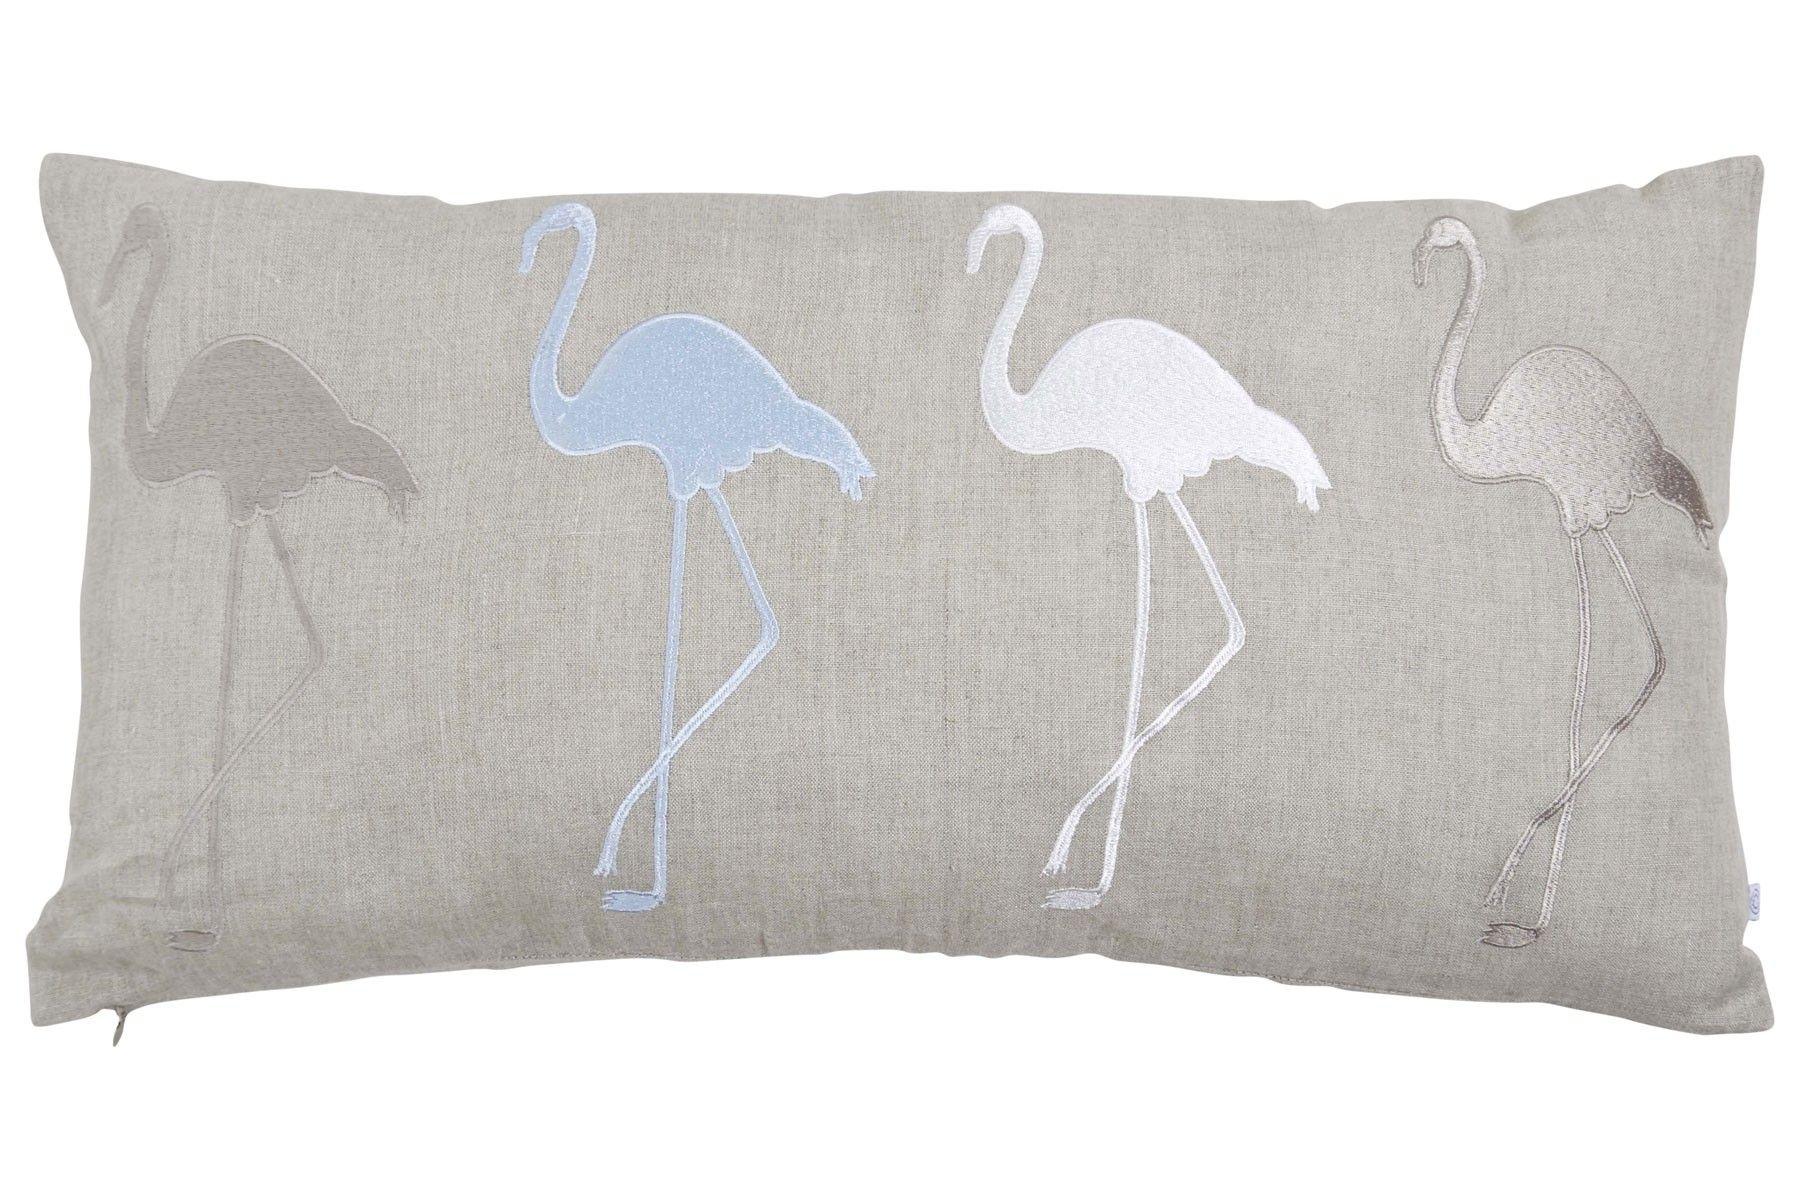 Sissy Boy Kussens : Sierkussen flamingo kussens homeland u au a sissy boy flamingo